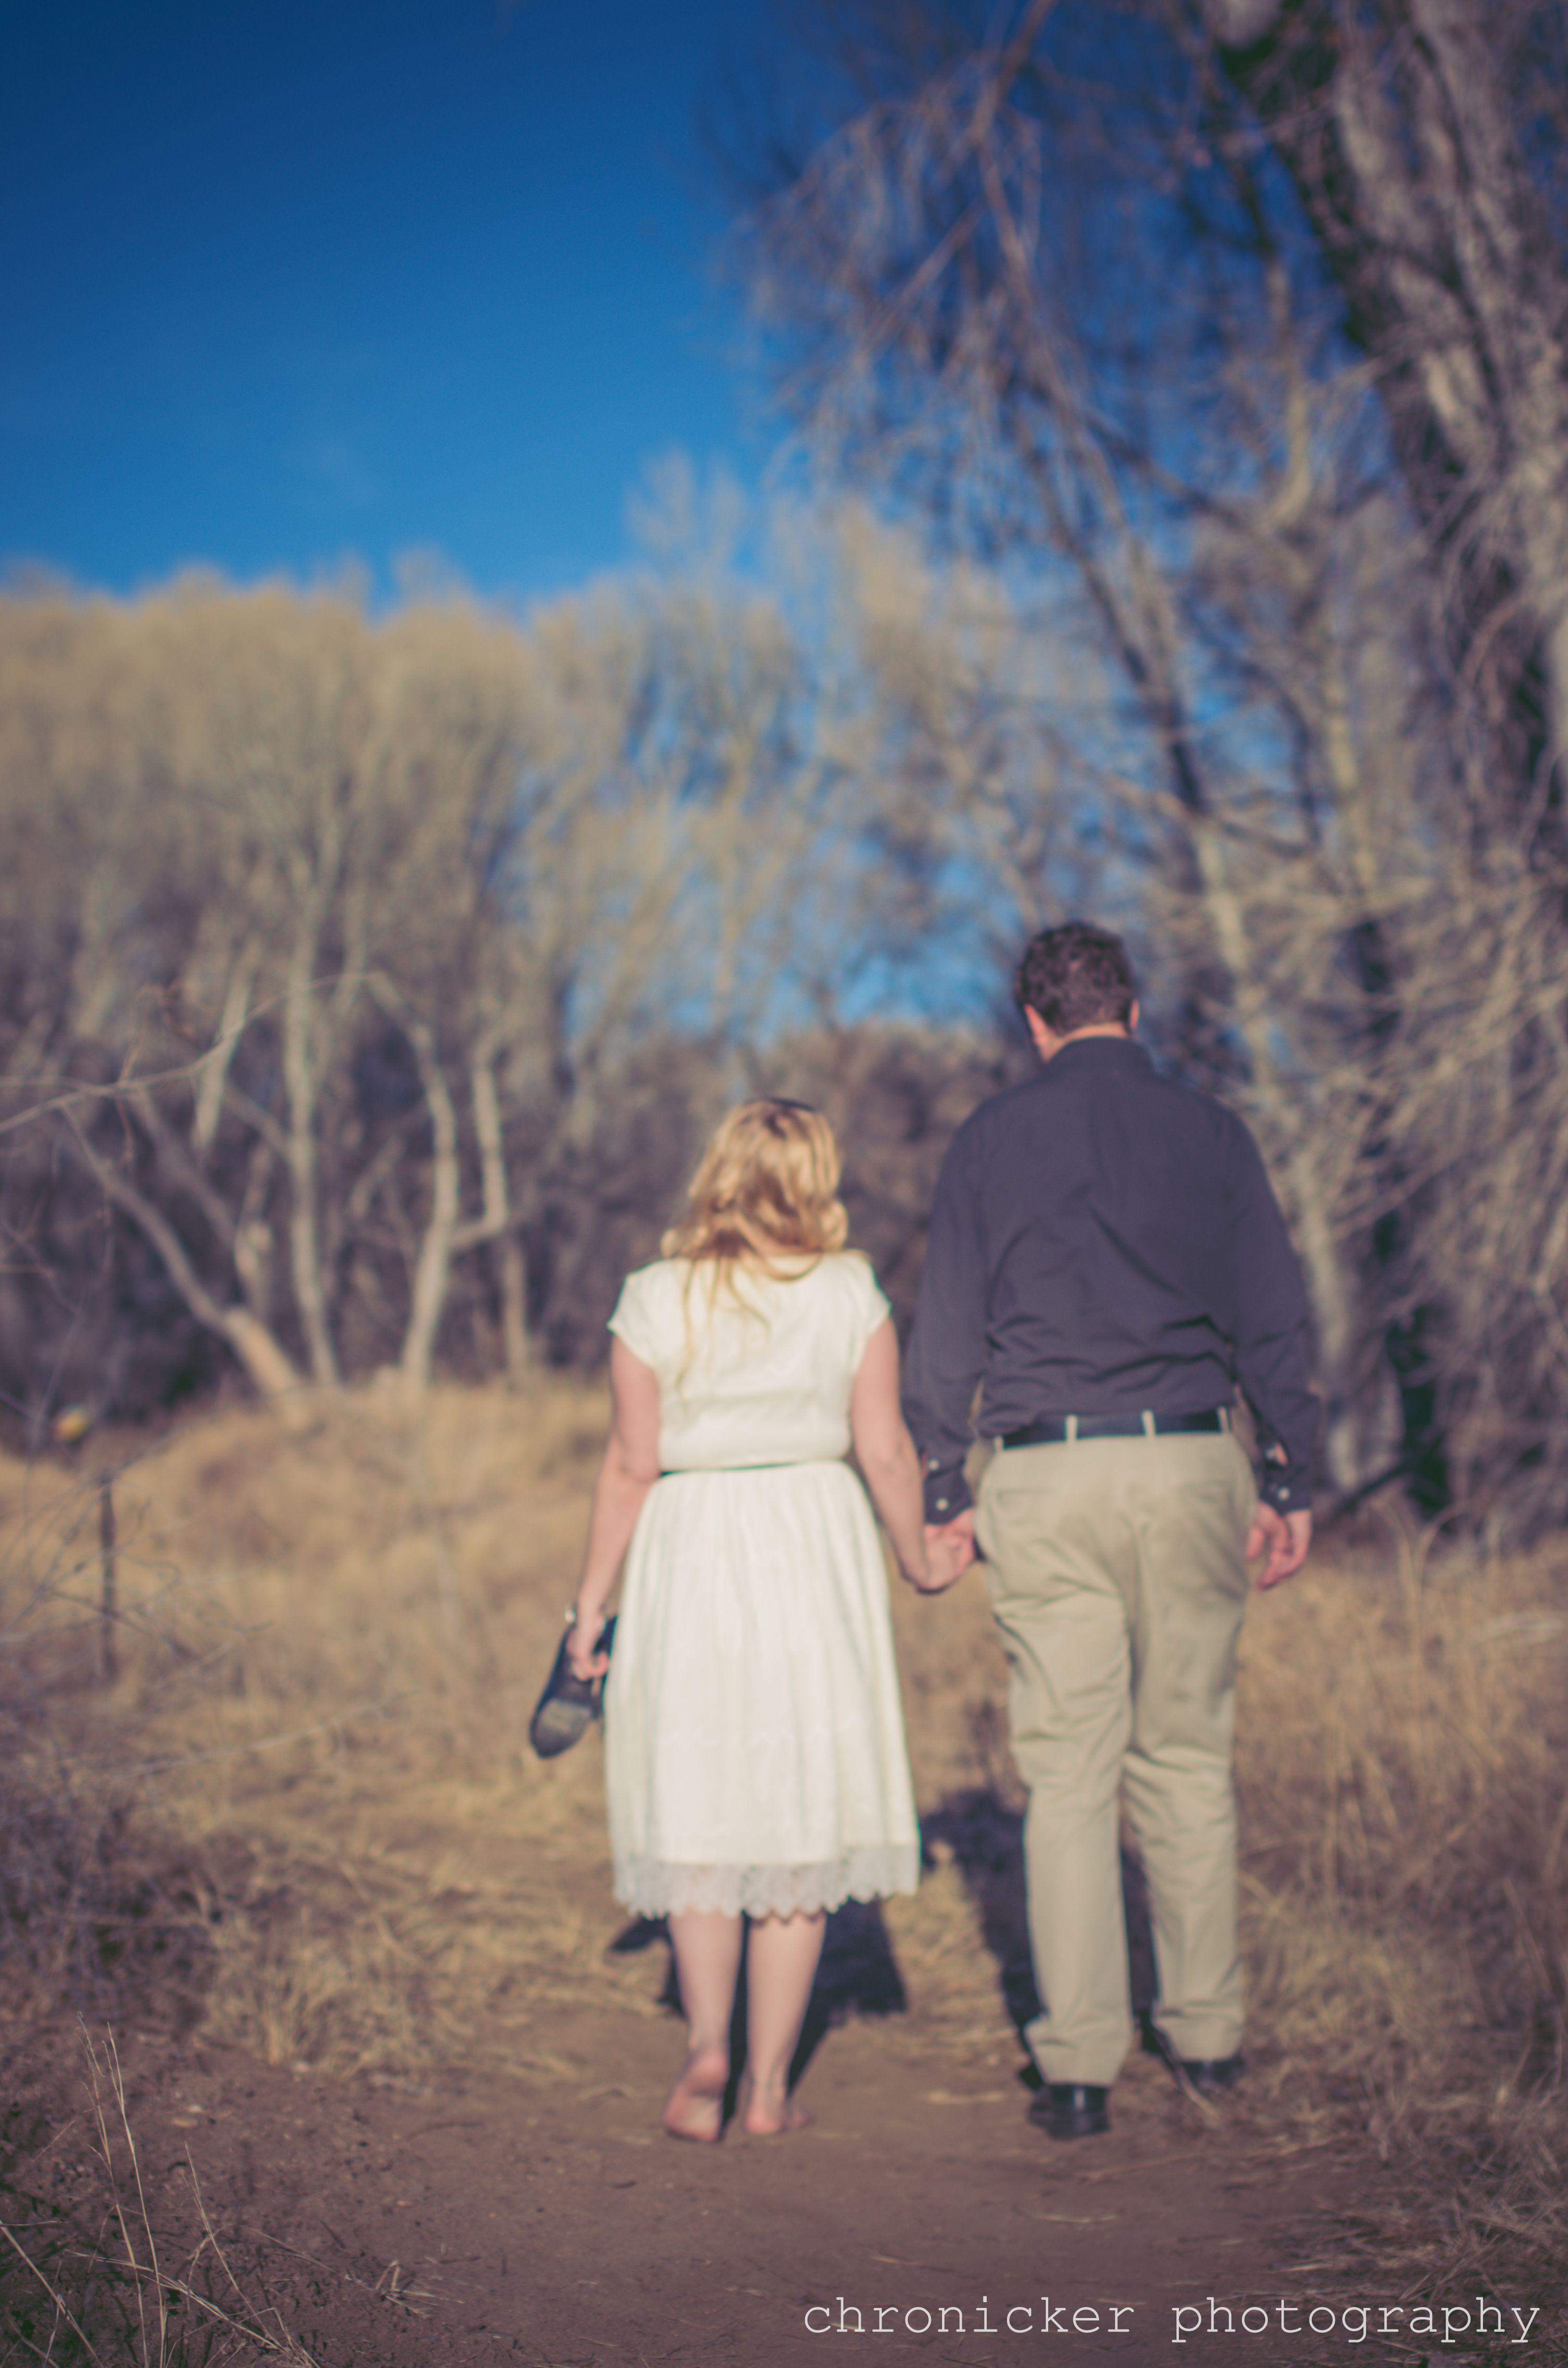 Valentine's Couple Photo taken by Chad Castigliano, Chronicker,LLC